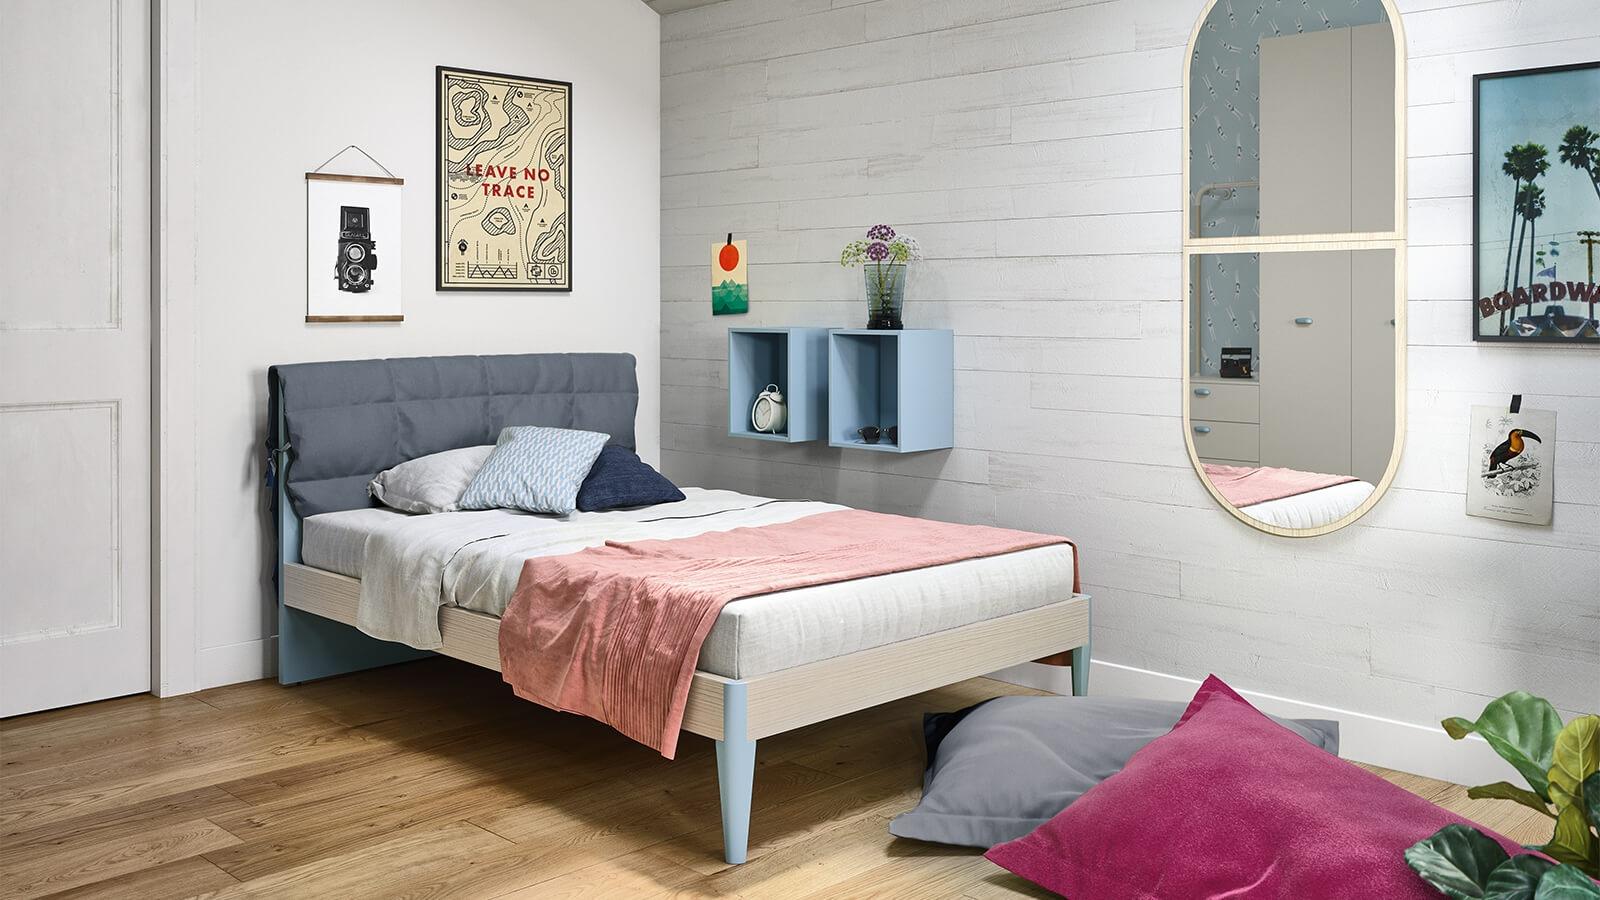 Cameretta teens nidi my beach arredamento design - Camere da letto per teenager ...